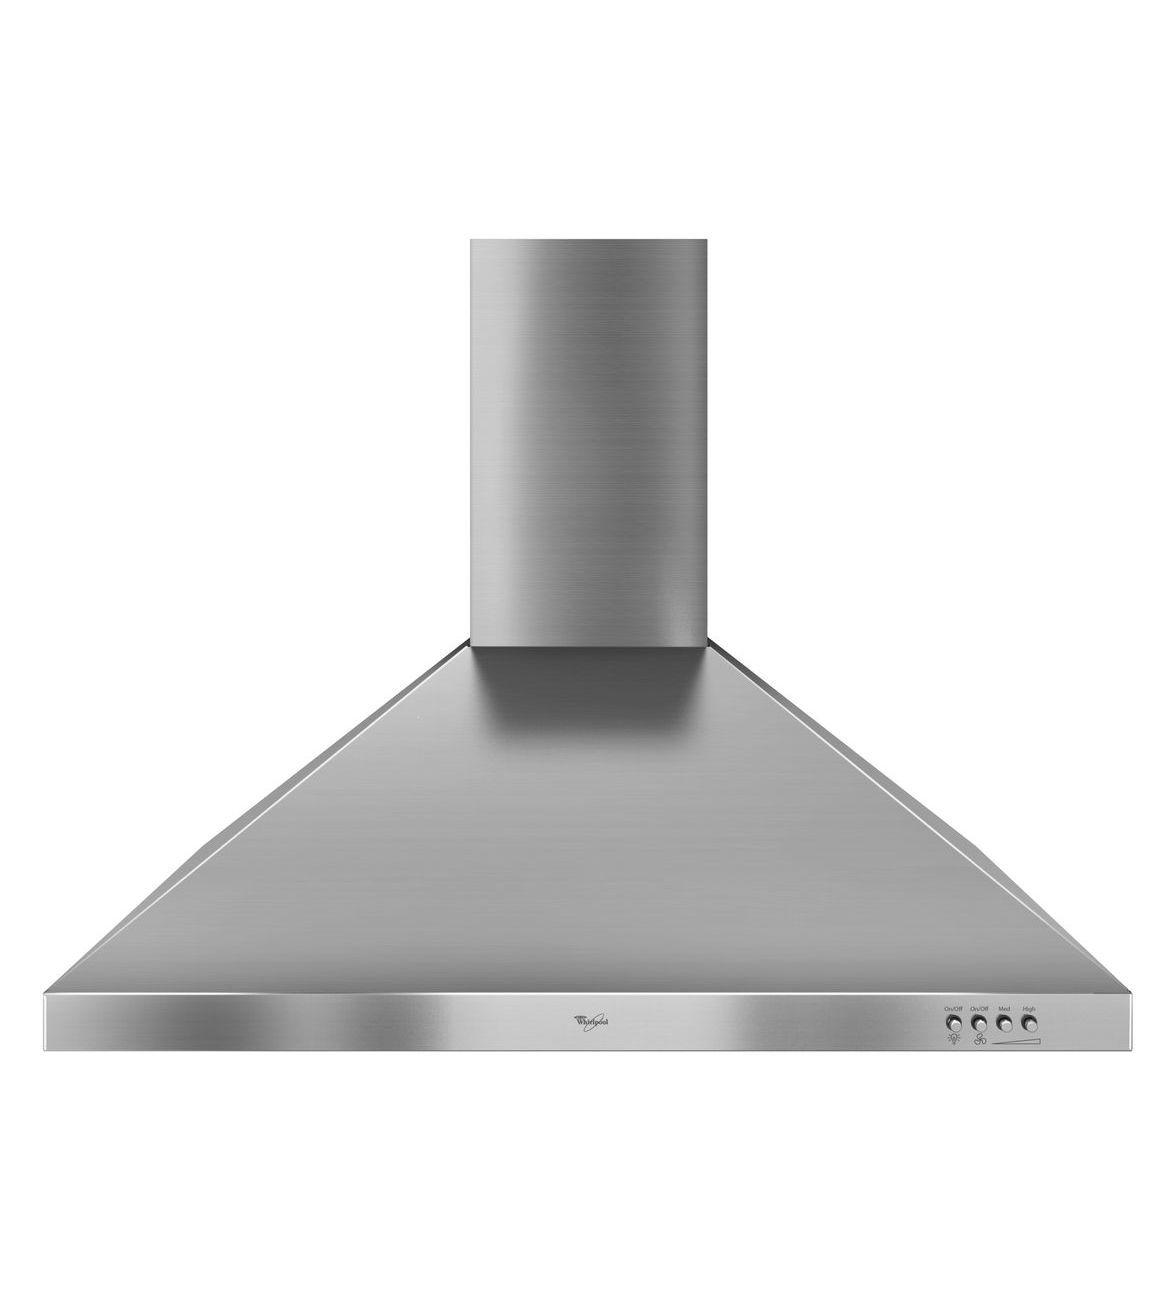 Groß Küchenlüftungshaube Ideen - Küche Set Ideen - deriherusweets.info